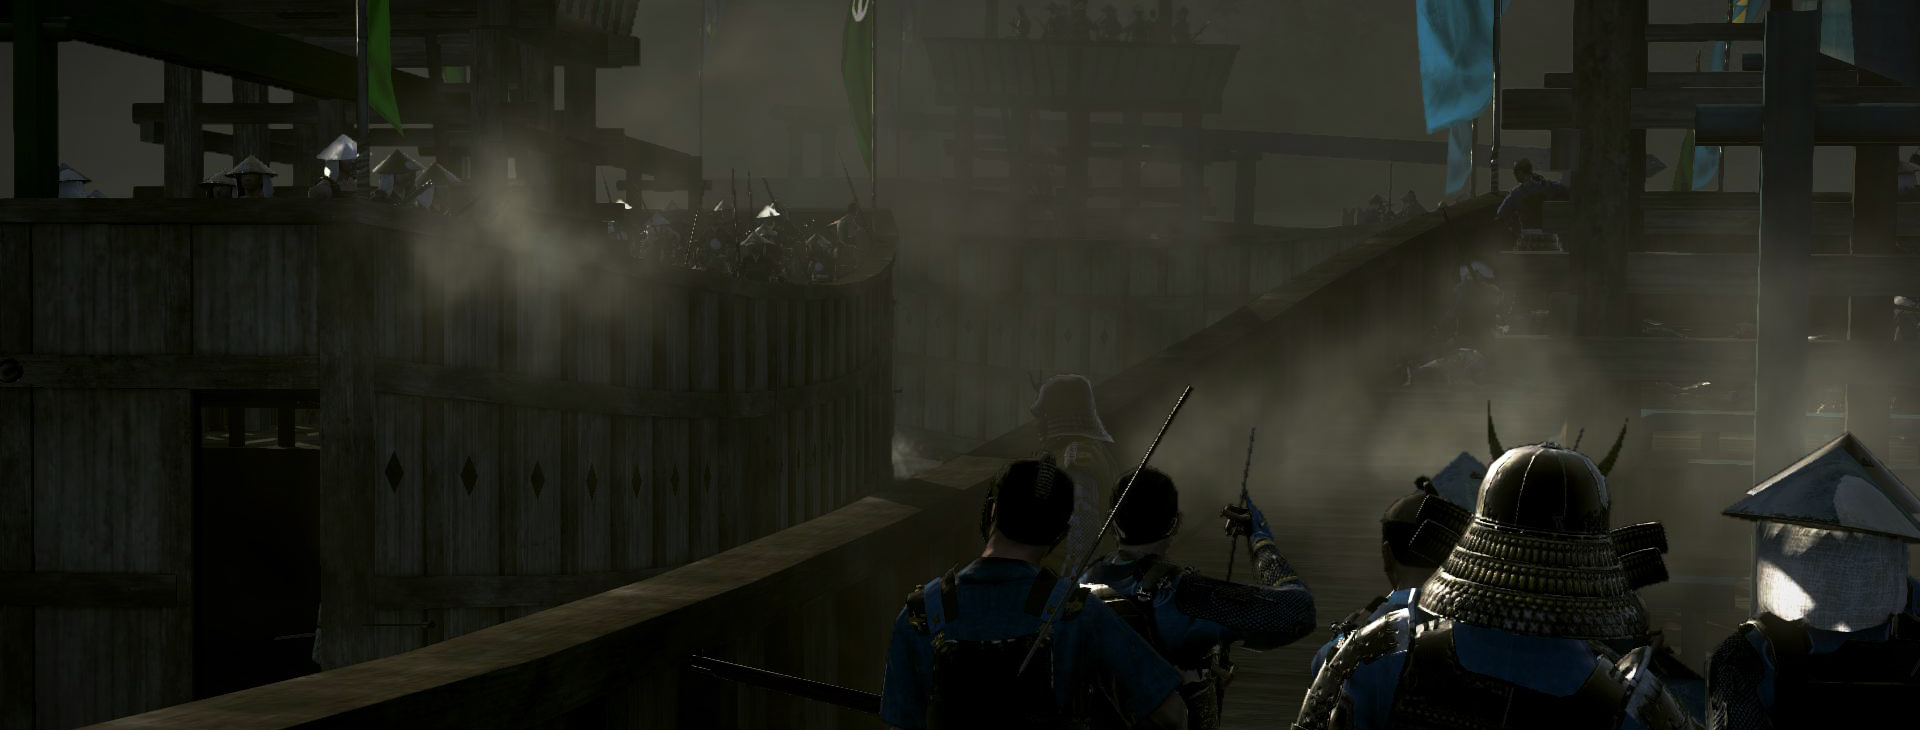 The Changelog Feature Darthmod Shogun Ii For Total War